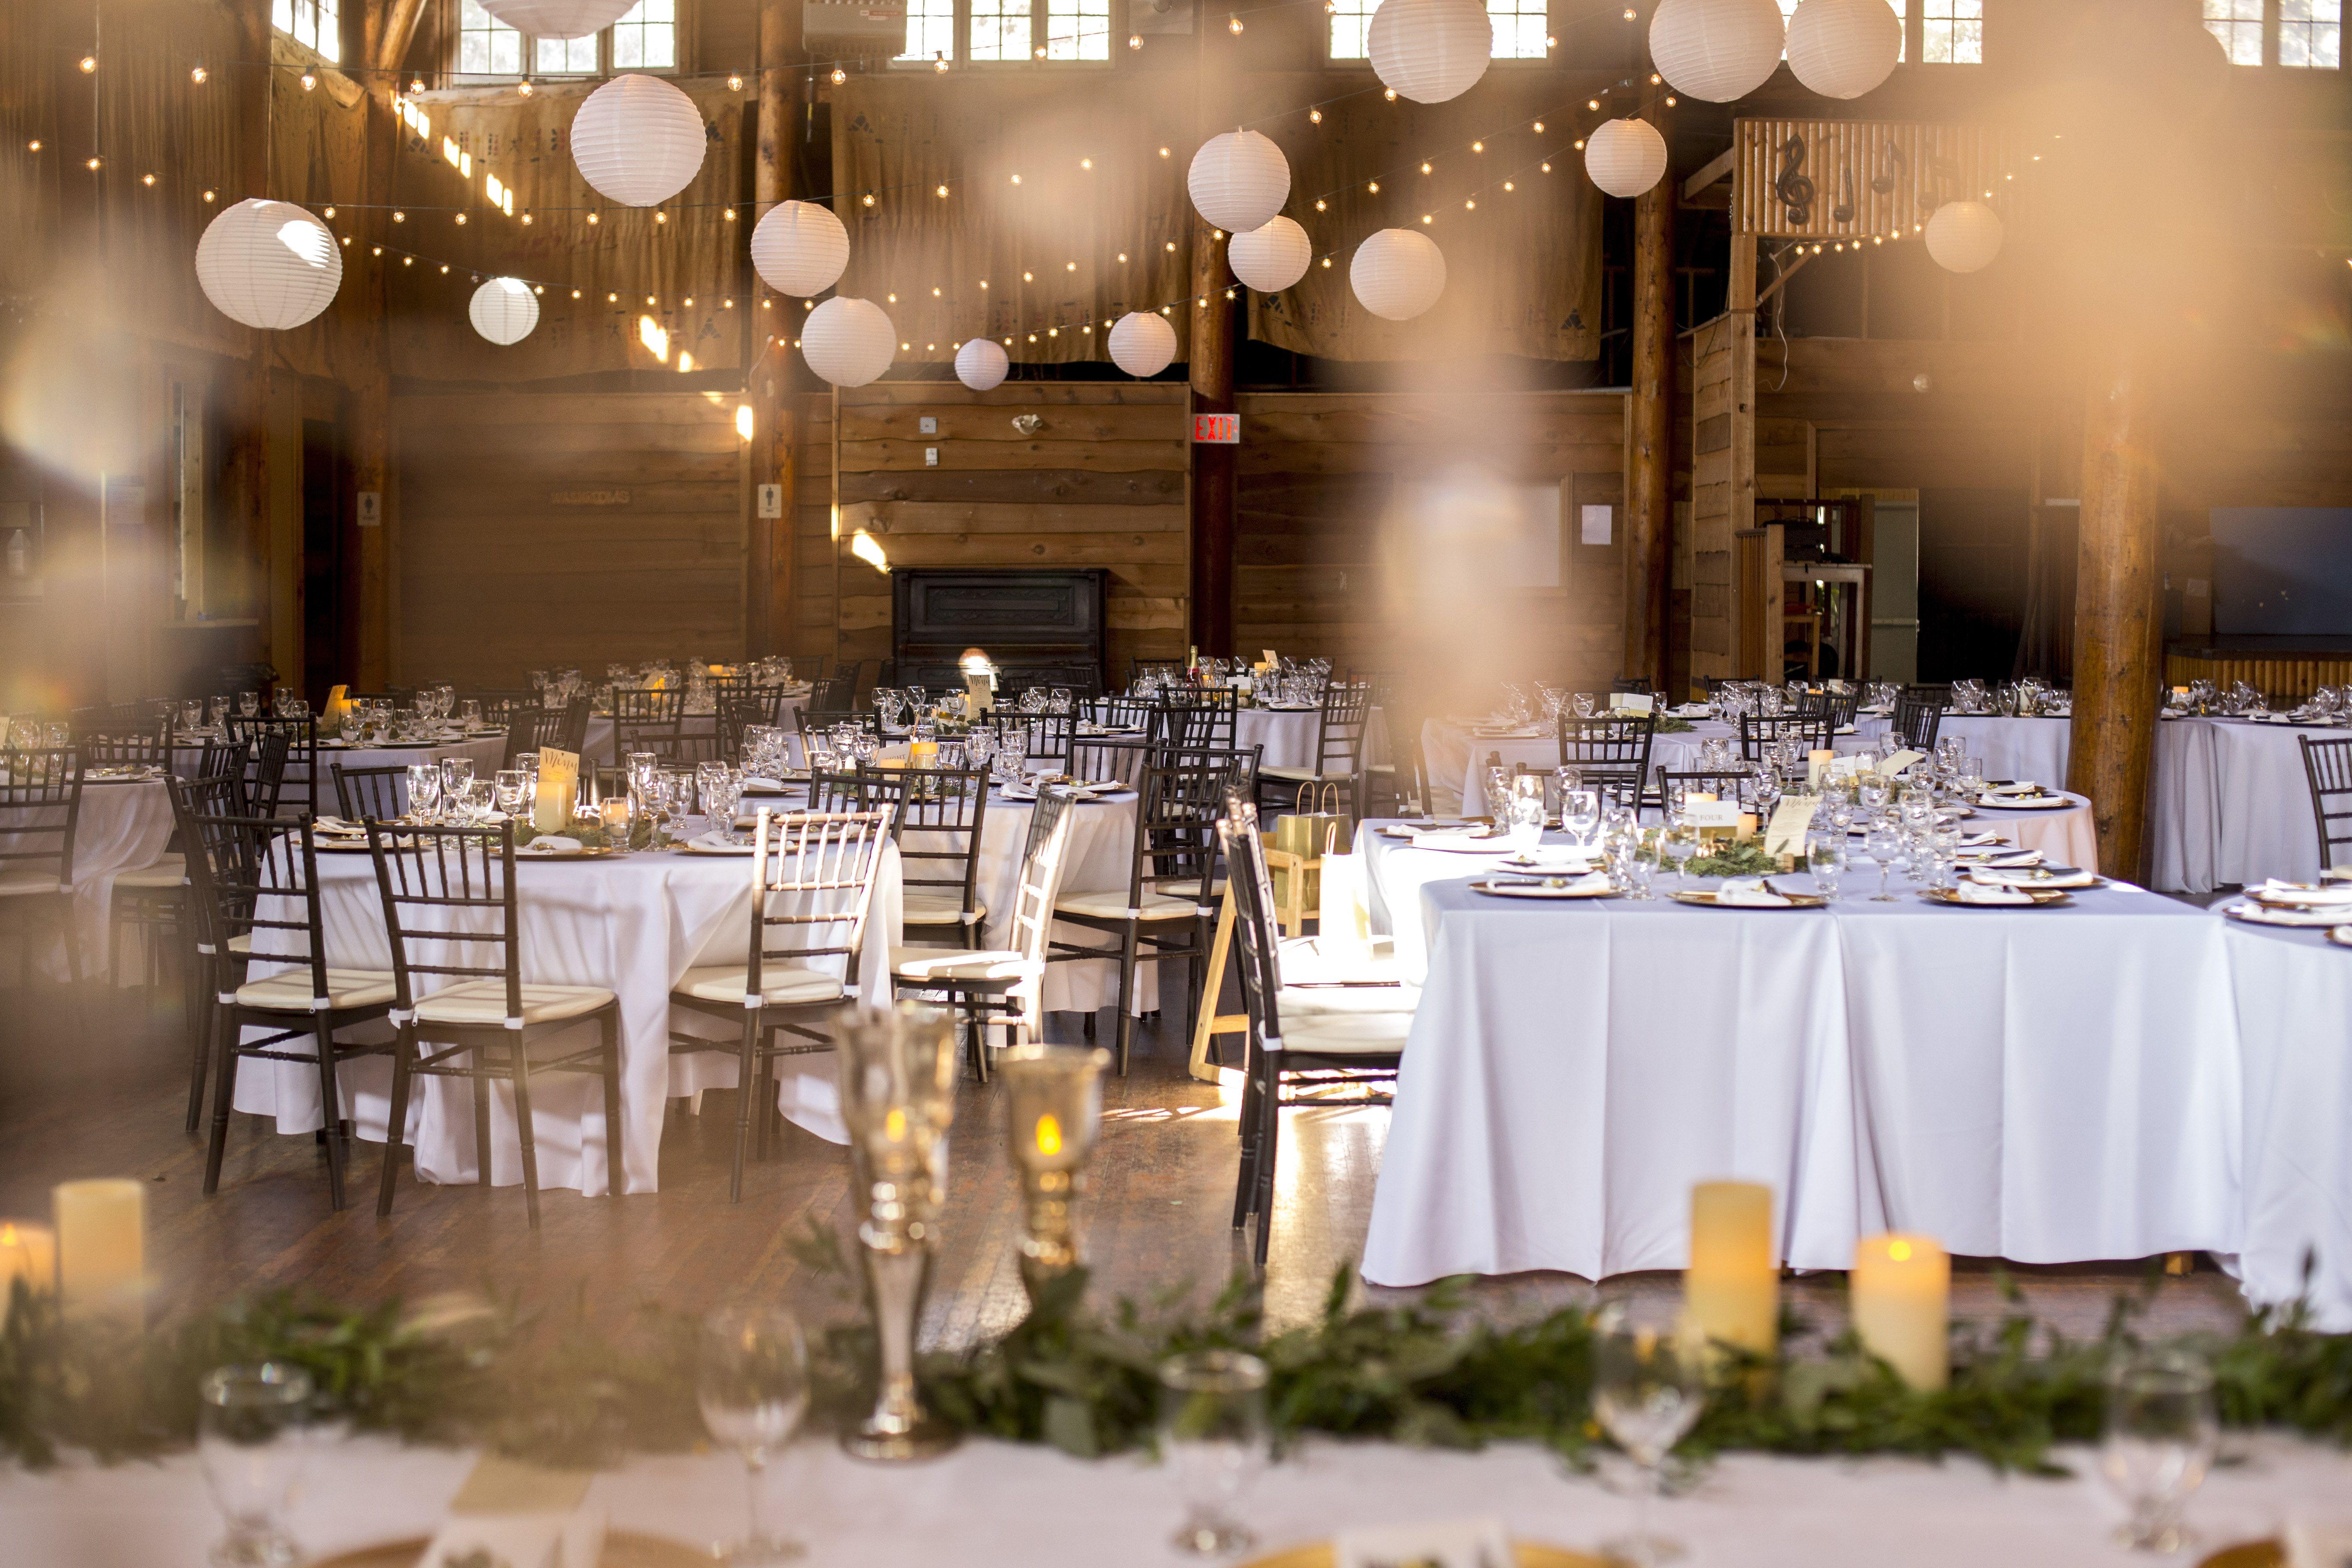 Beautiful Rustic Wedding Venue in Clear Lake, Manitoba ...